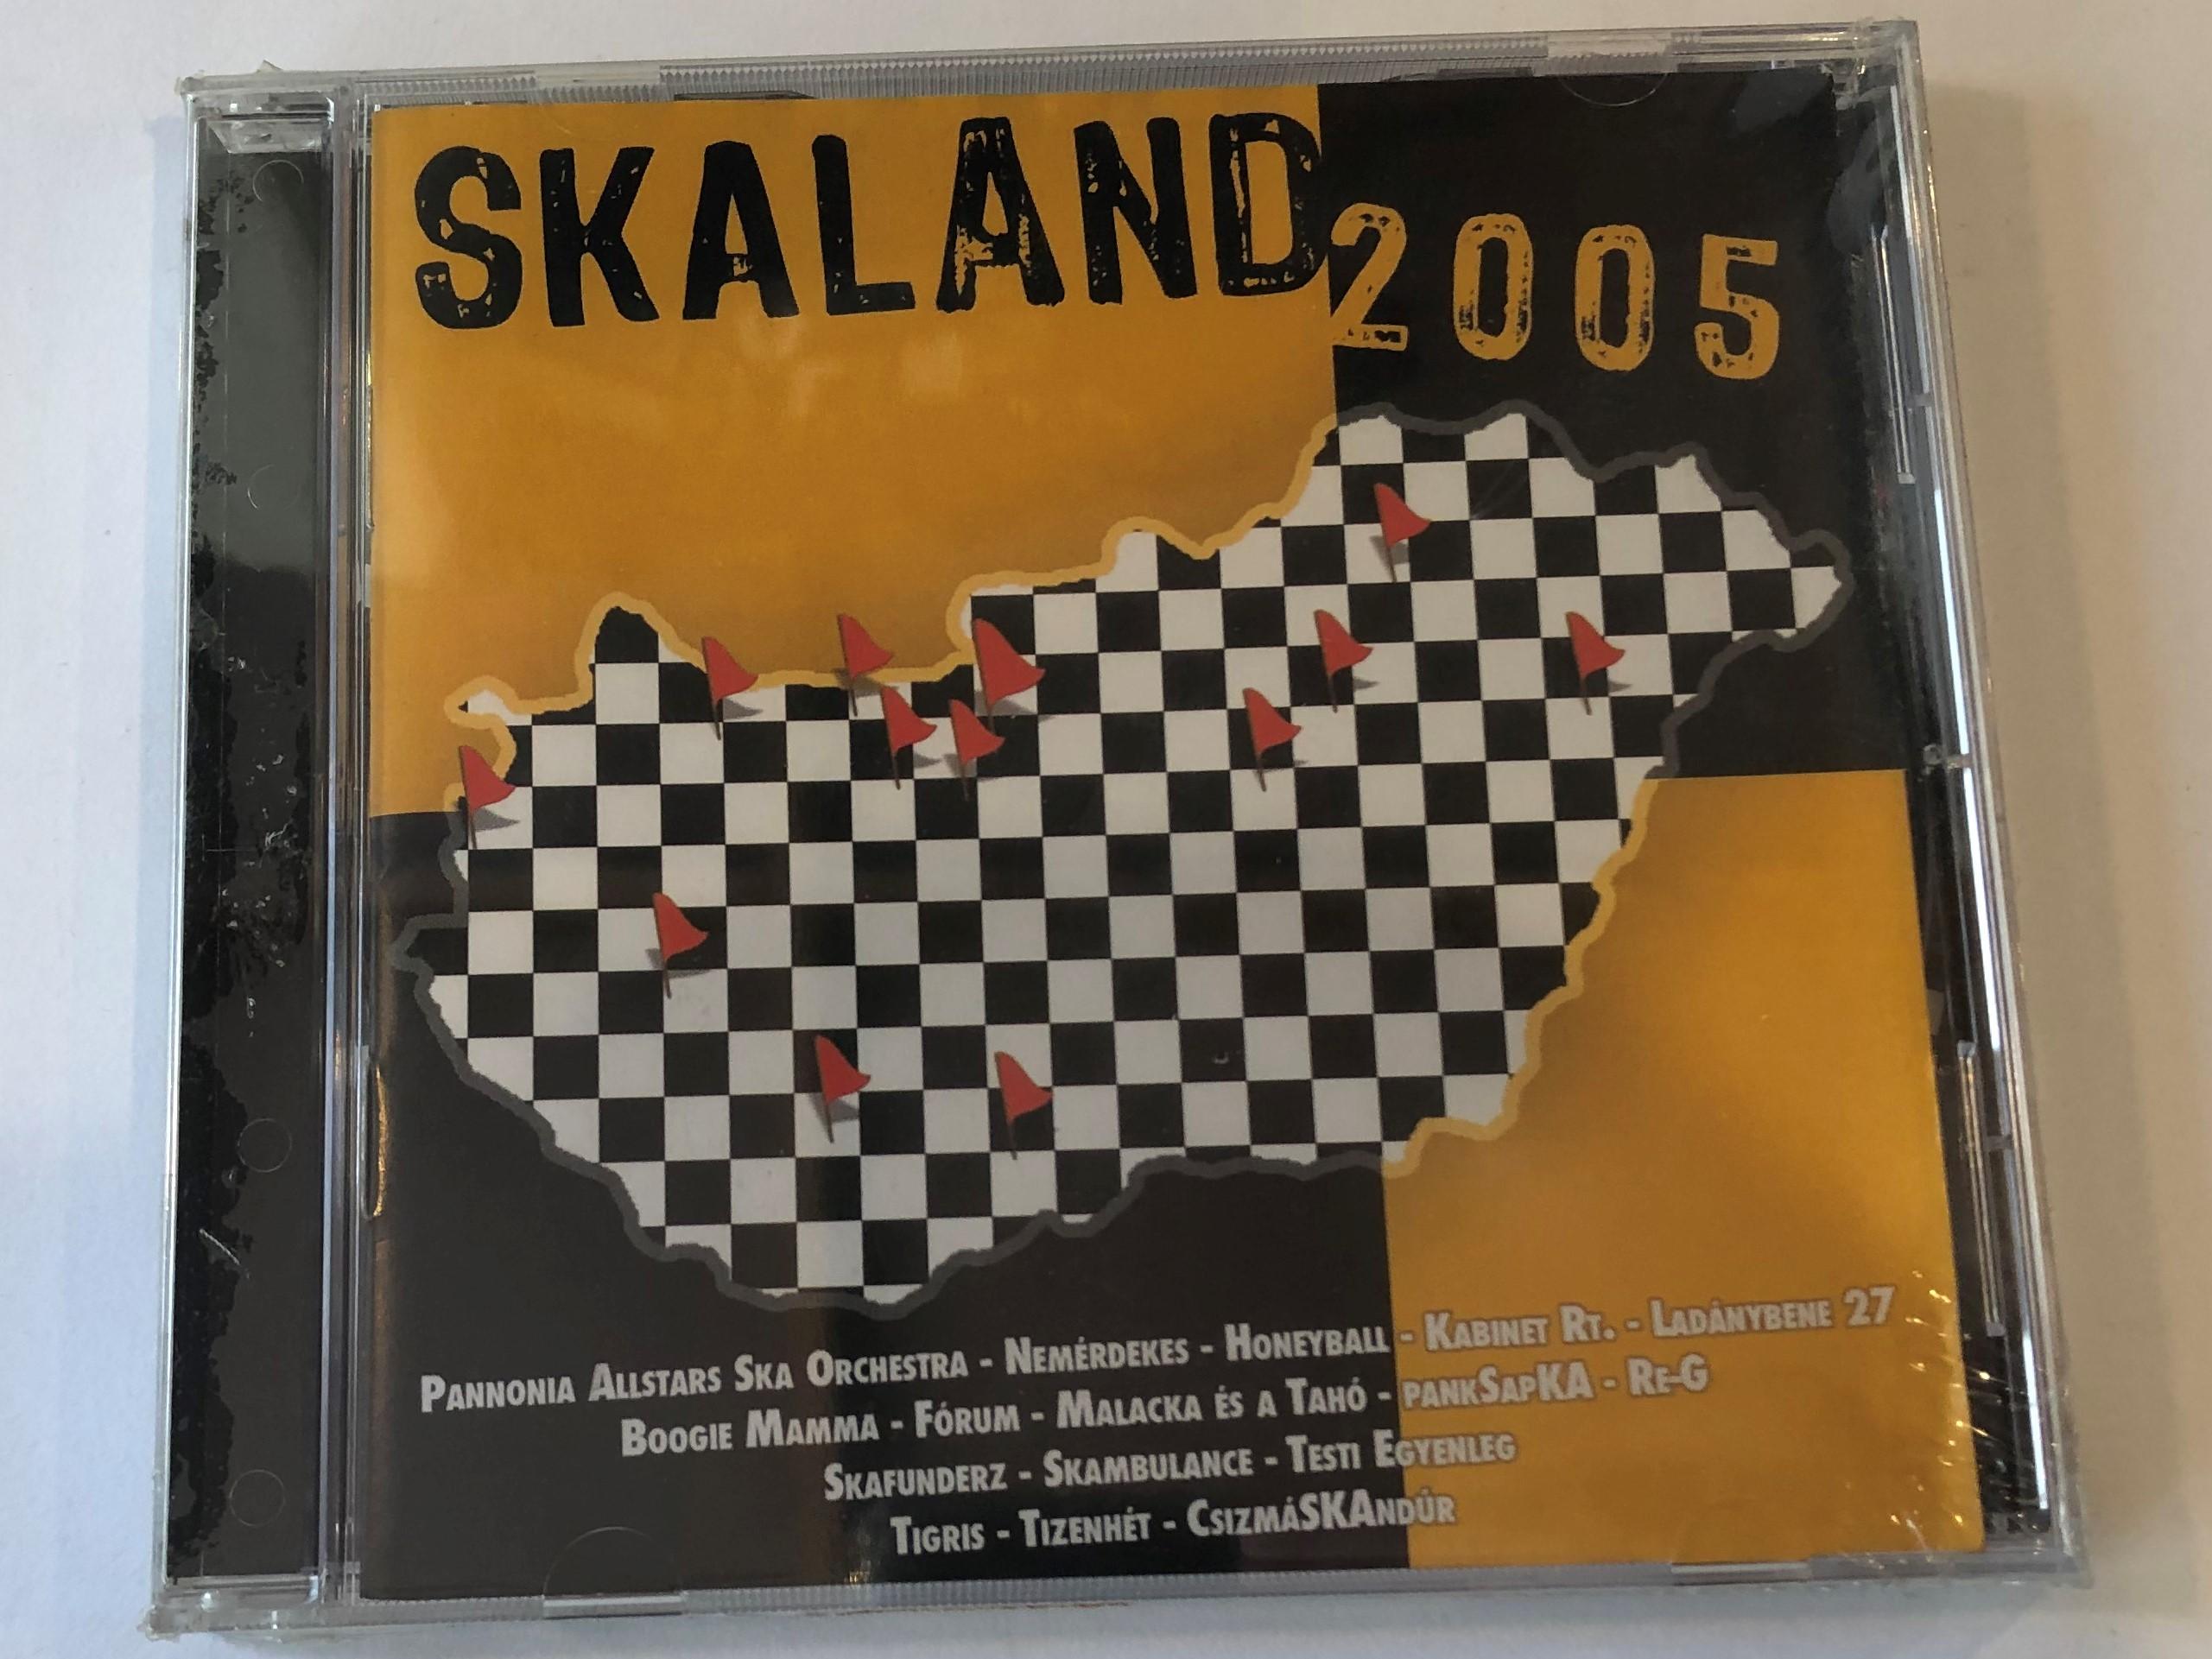 skaland-2005-pannonia-allstars-ska-orchestra-nem-rdekes-honeyball-kabinet-rt.-lad-nybene-27-boogie-mamma-f-rum-malacka-s-a-tah-panksapka-re-g-skafunderz-skambulance-crossroads-rec-1-.jpg